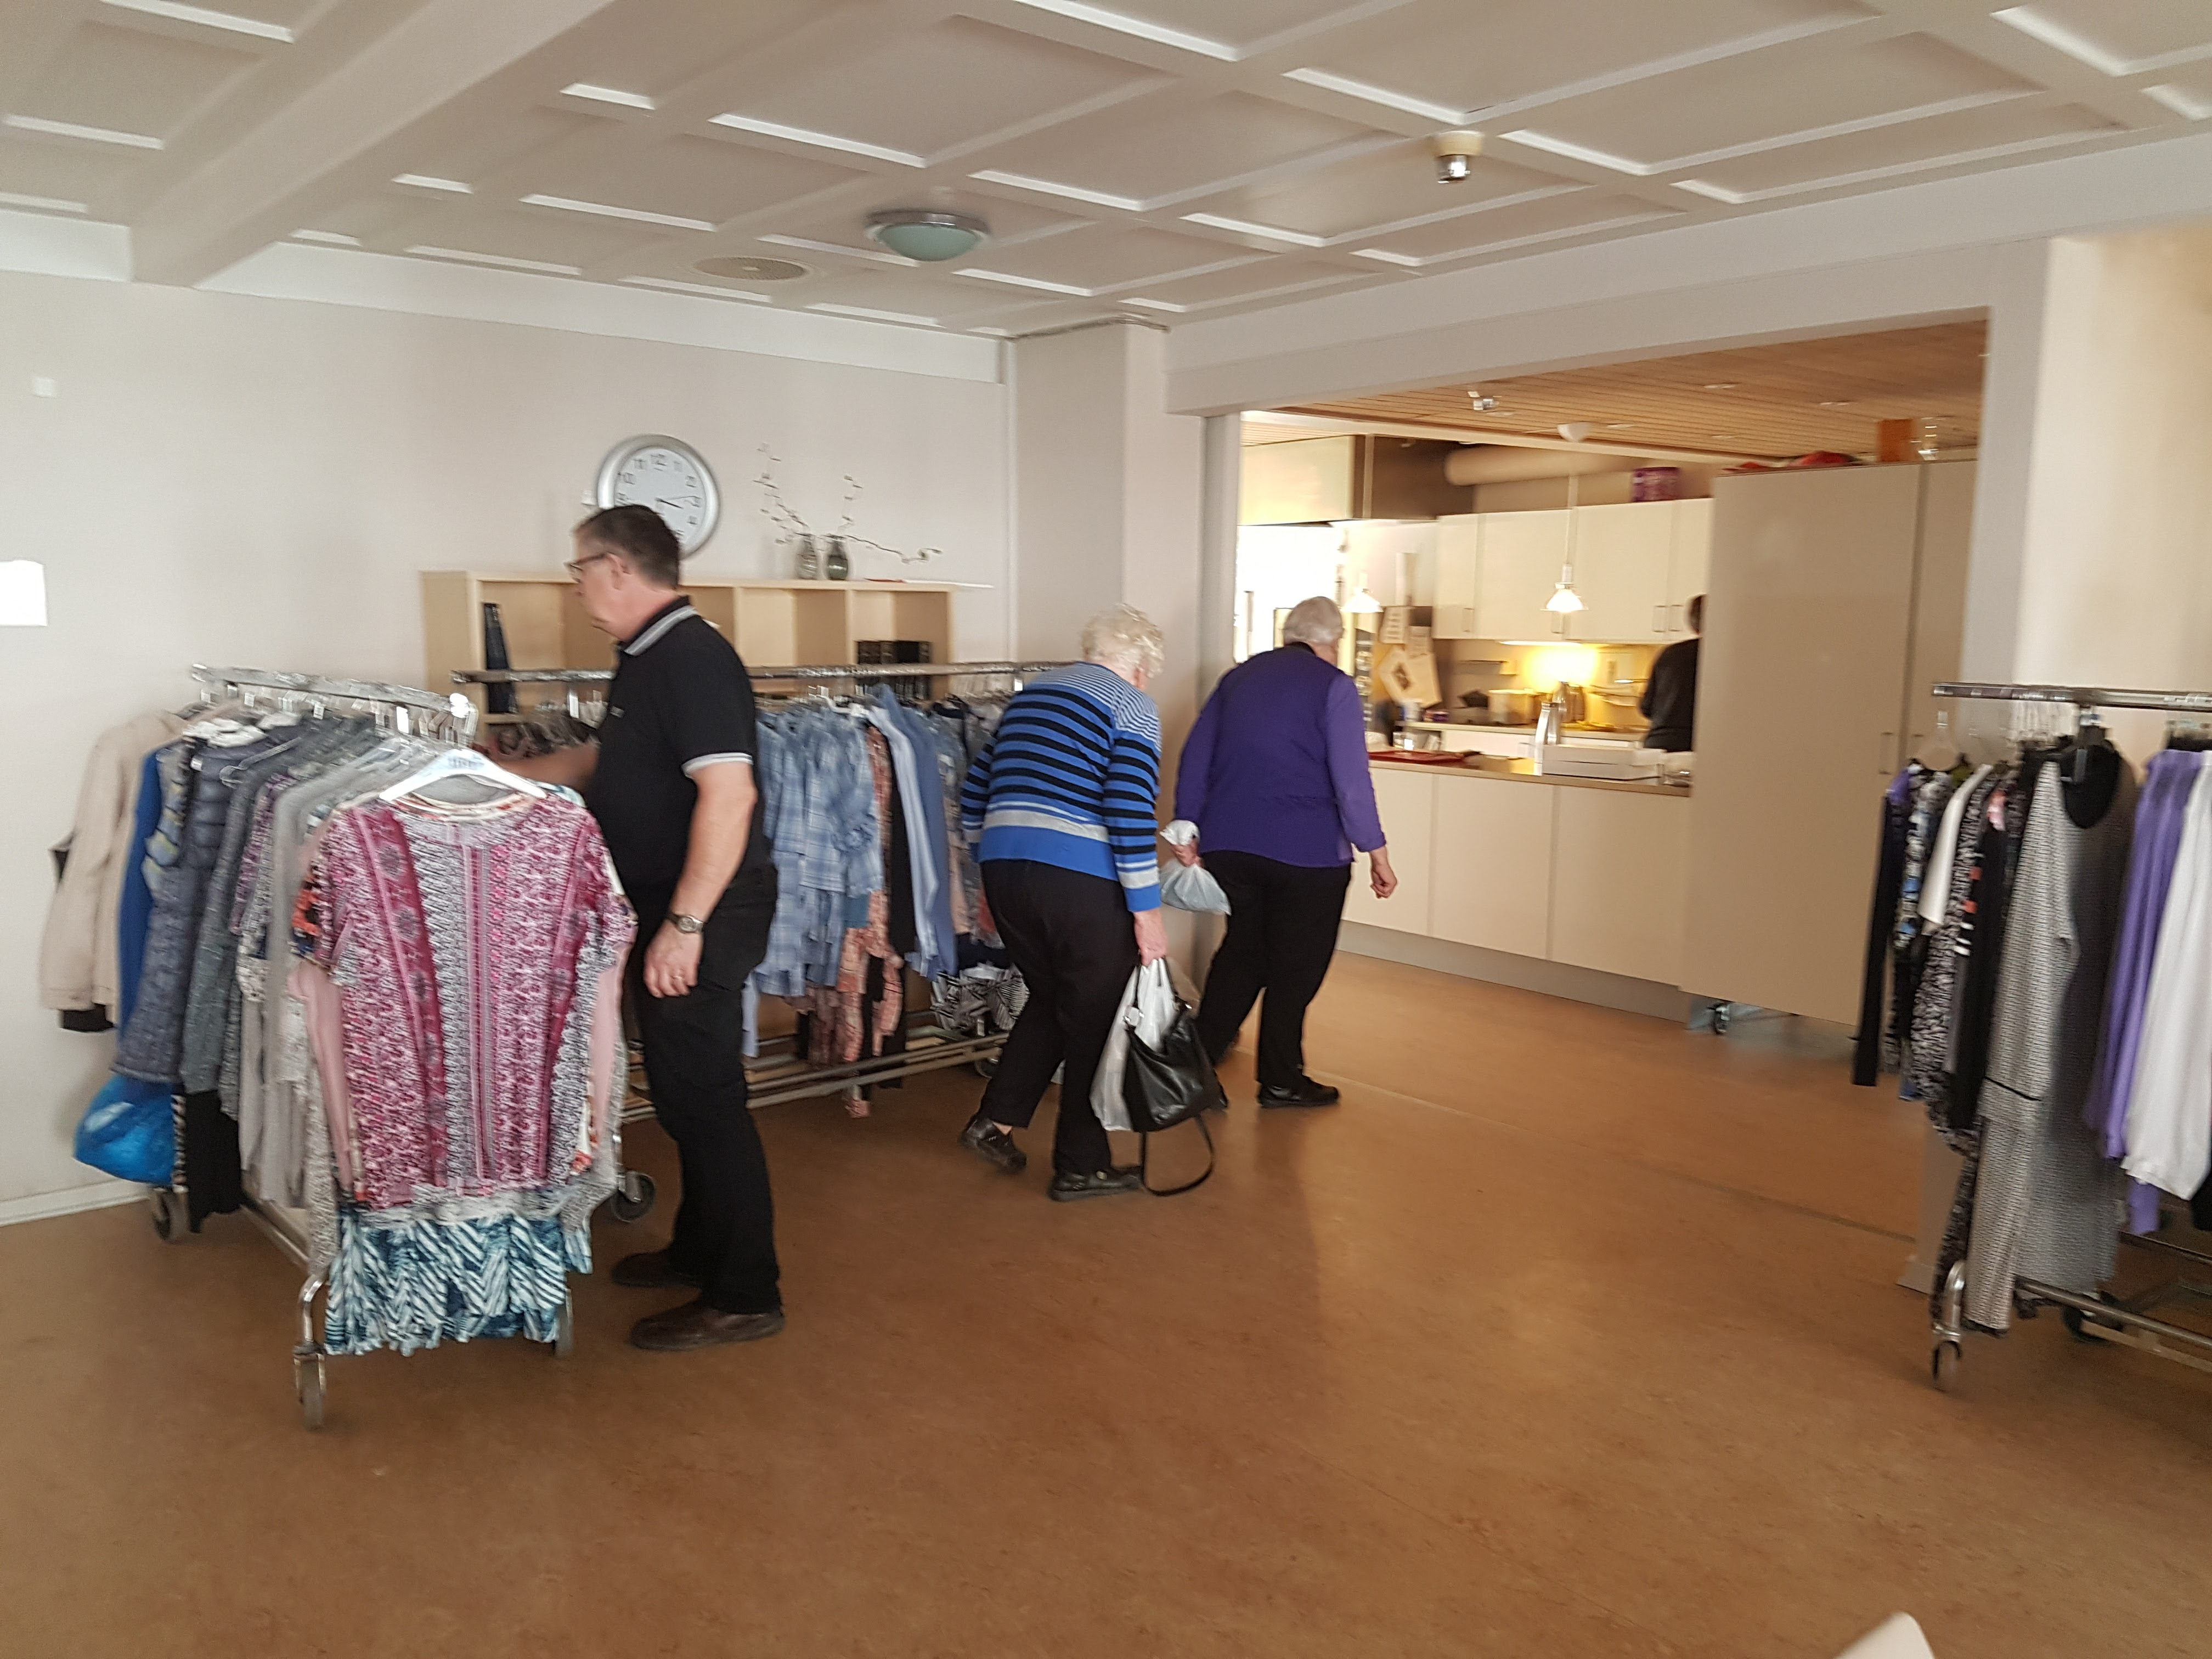 64229c1d351b Rullende tøjbutik til ældre (7 år gammel